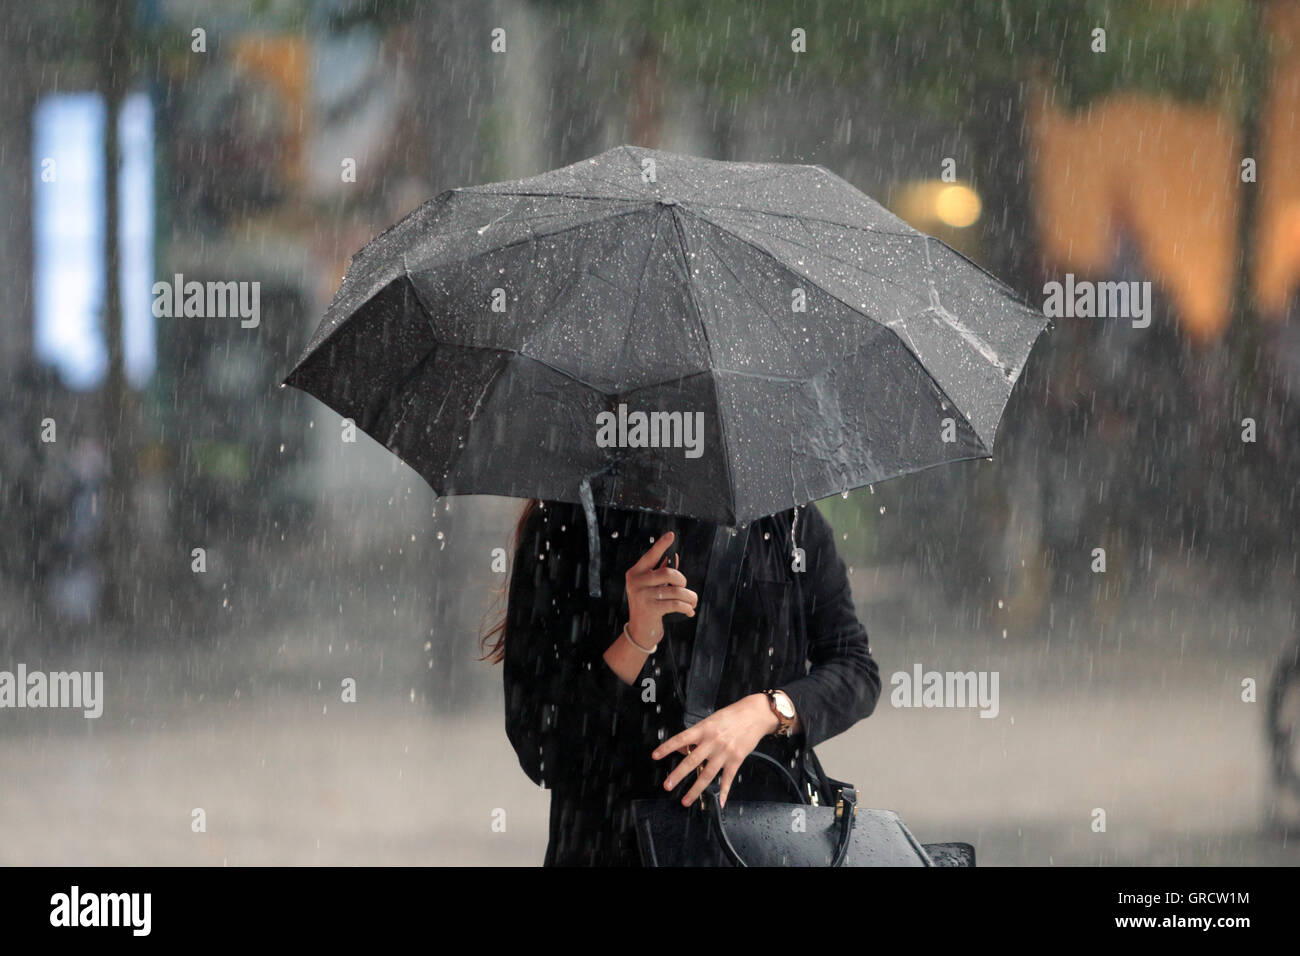 Woman With Umbrella In Heavy Rain - Stock Image